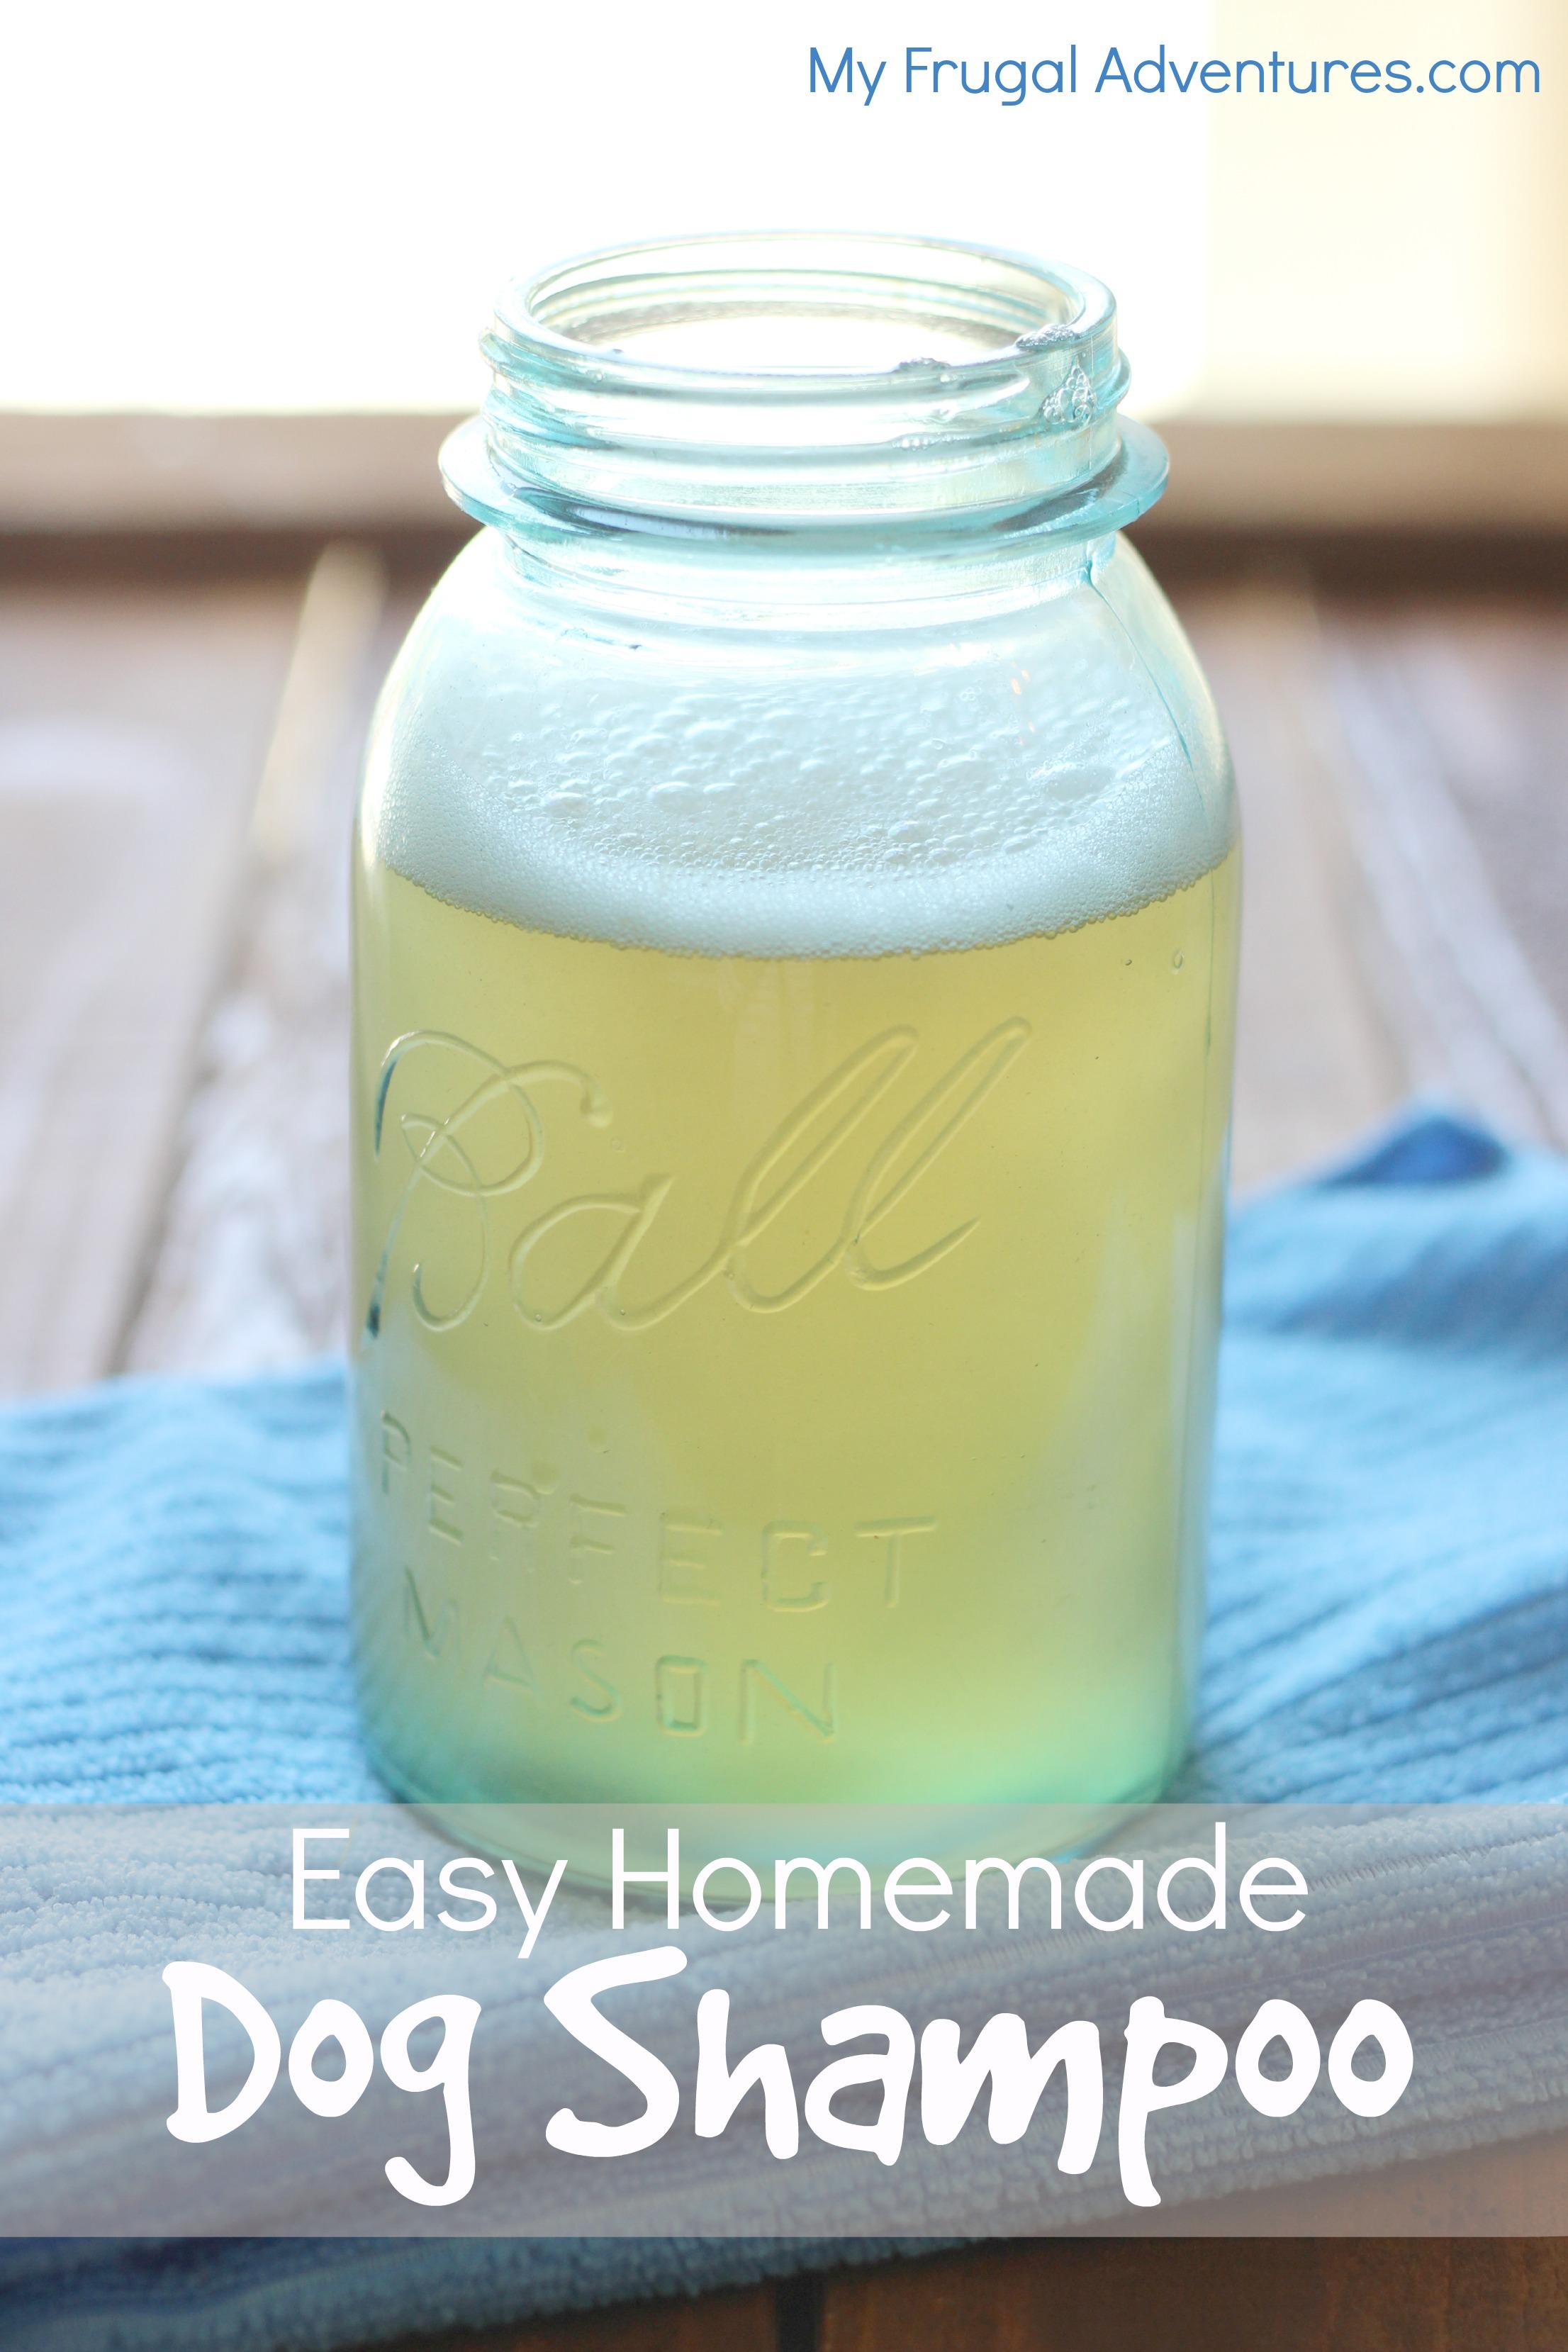 Homemade Dog Shampoo Recipe - My Frugal